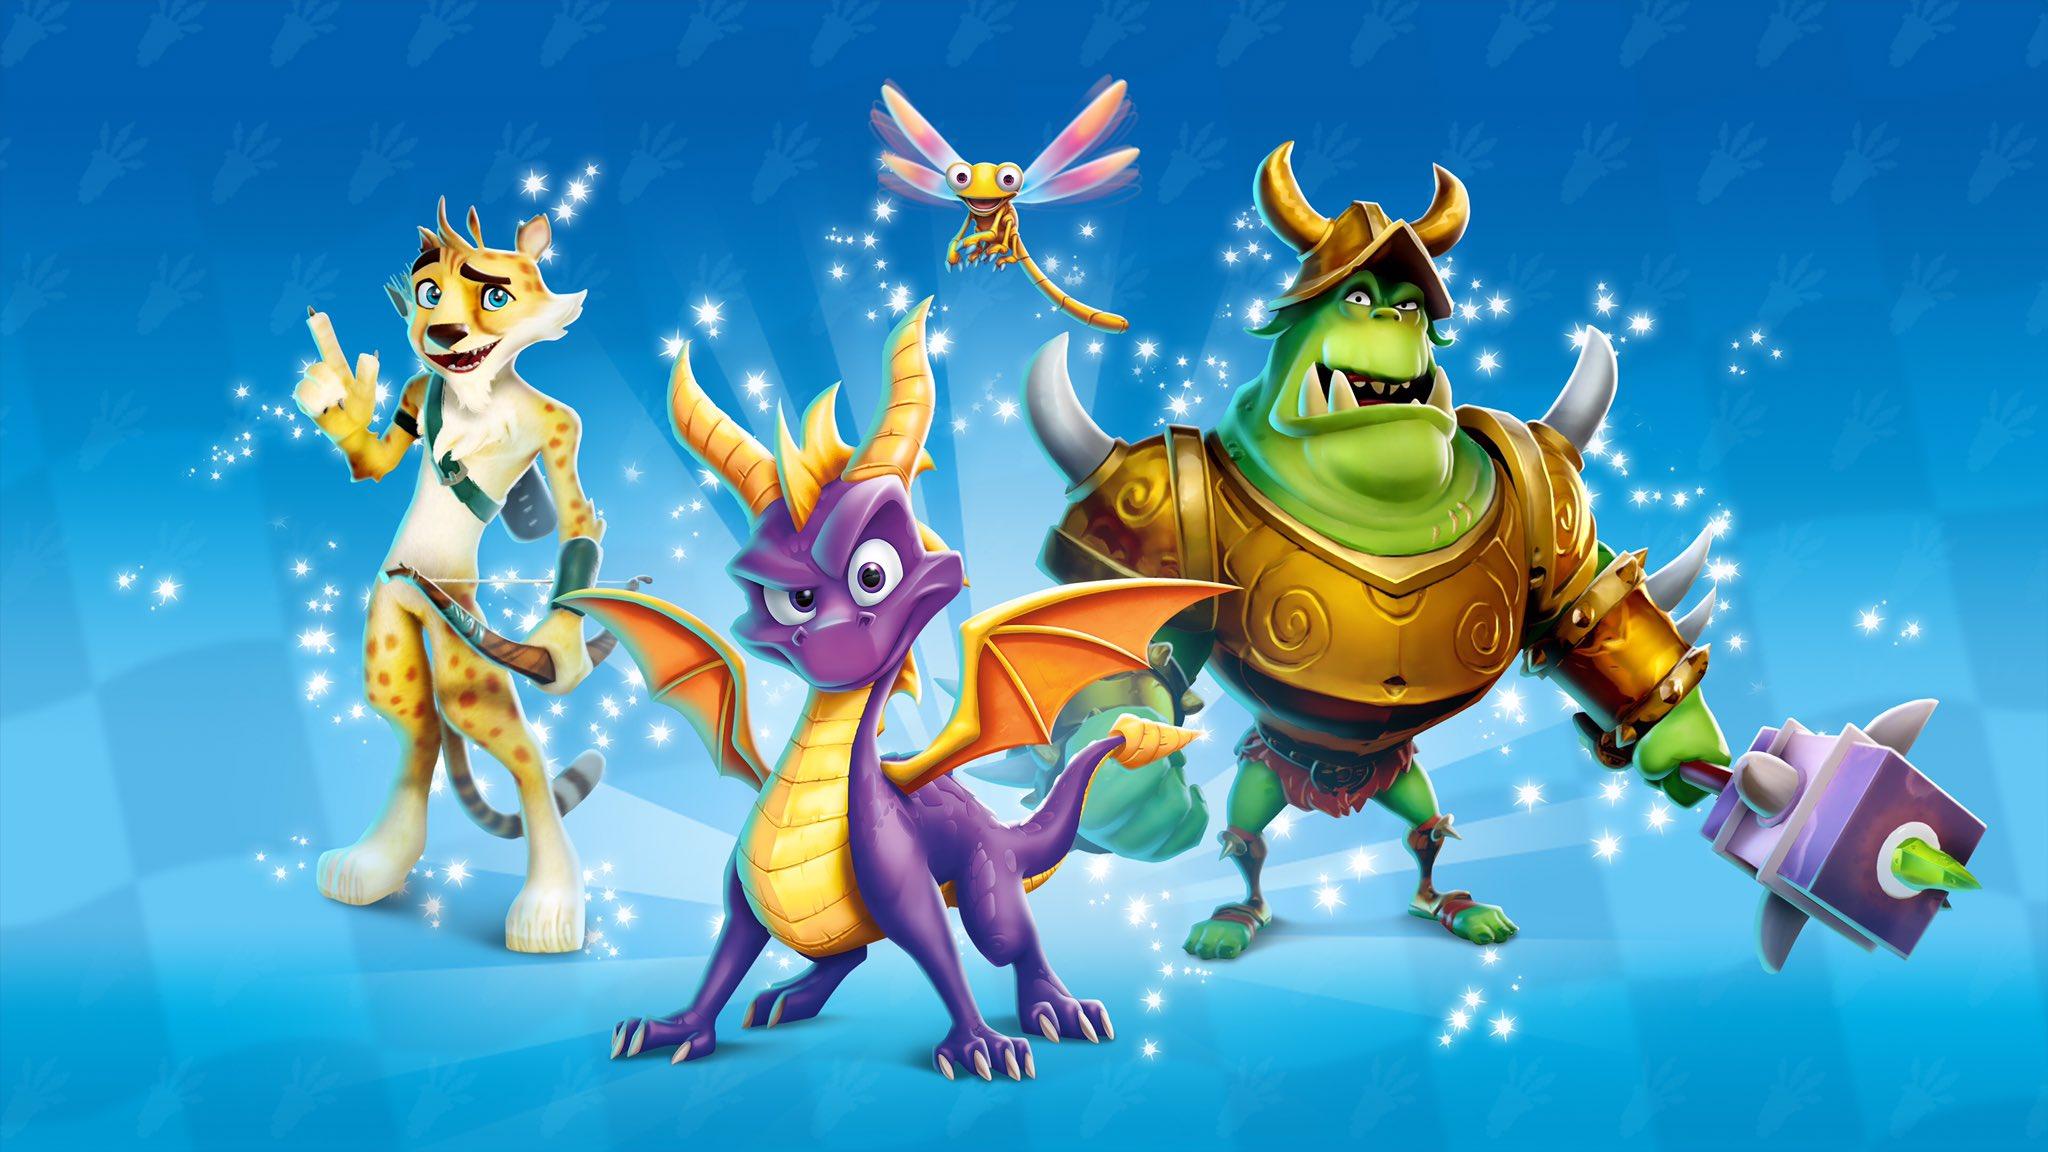 Crash Bandicoot: Spyro & Friends Grand Prix Characters